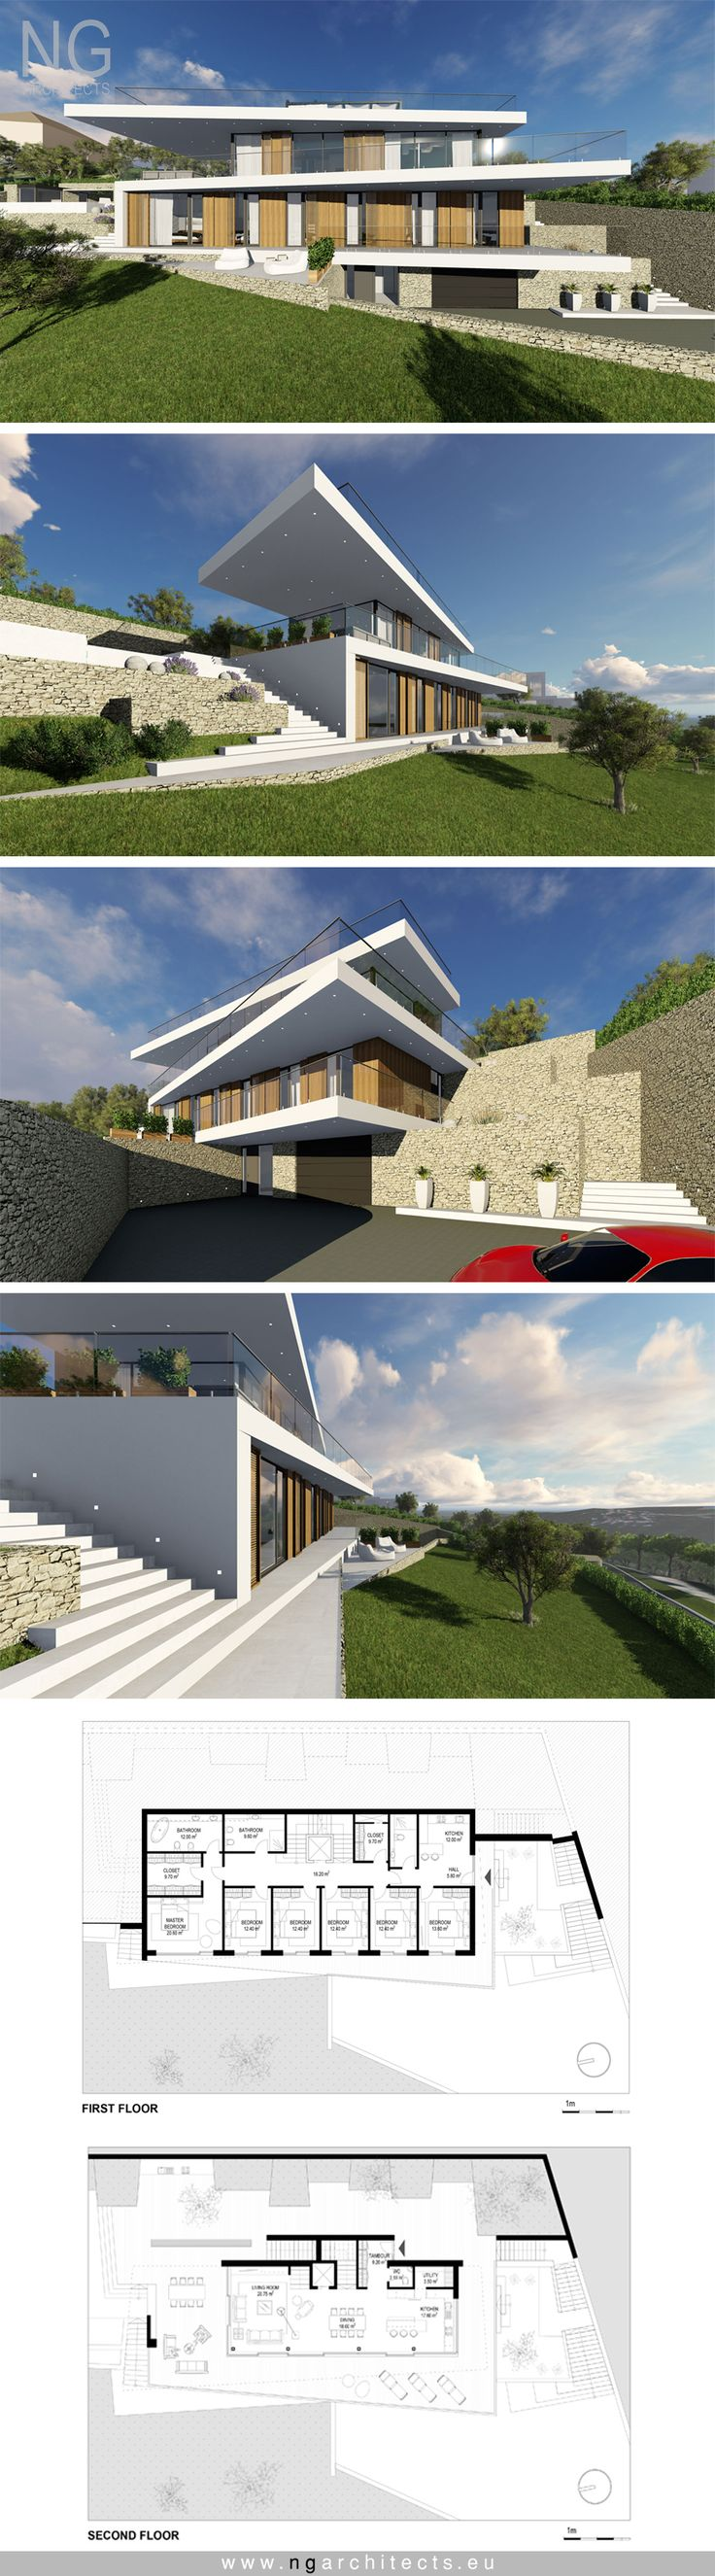 modern villa Horizon designed by NG architects www.ngarchitects.eu